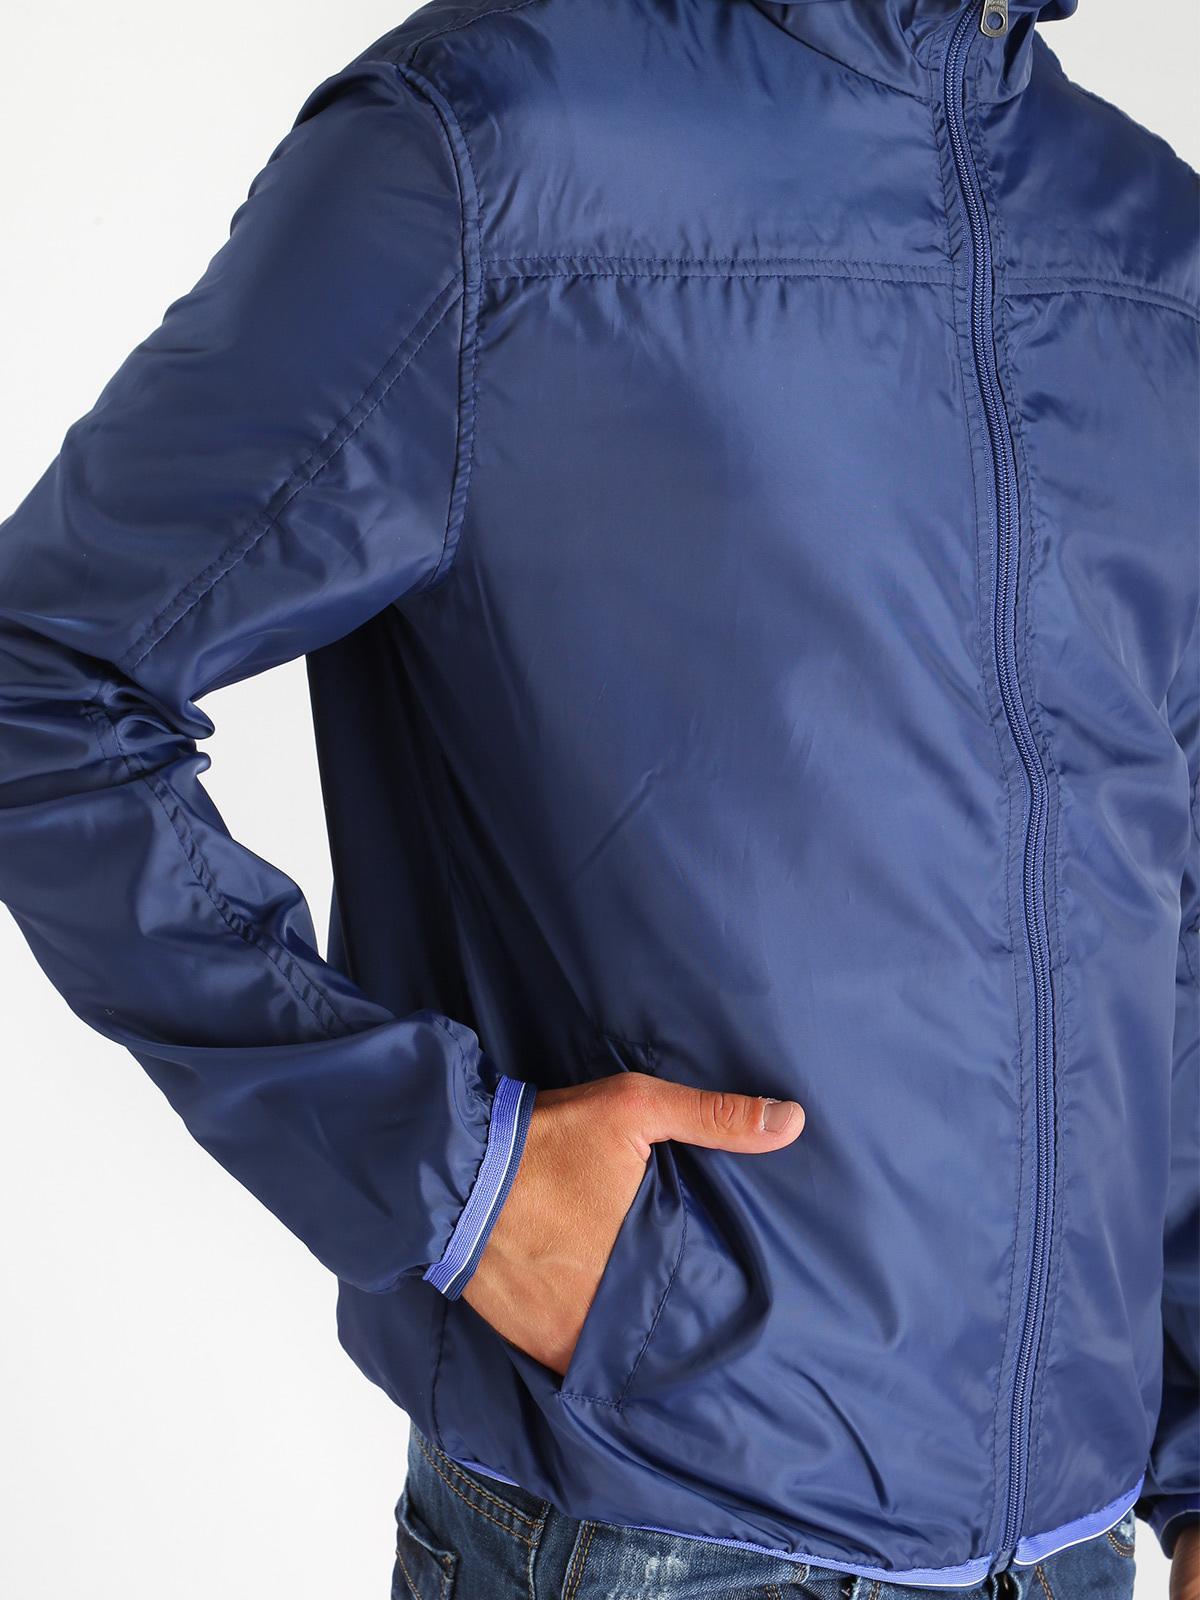 buy popular 8a7ac 93498 Giacca da pioggia con cappuccio lonsdale   MecShopping